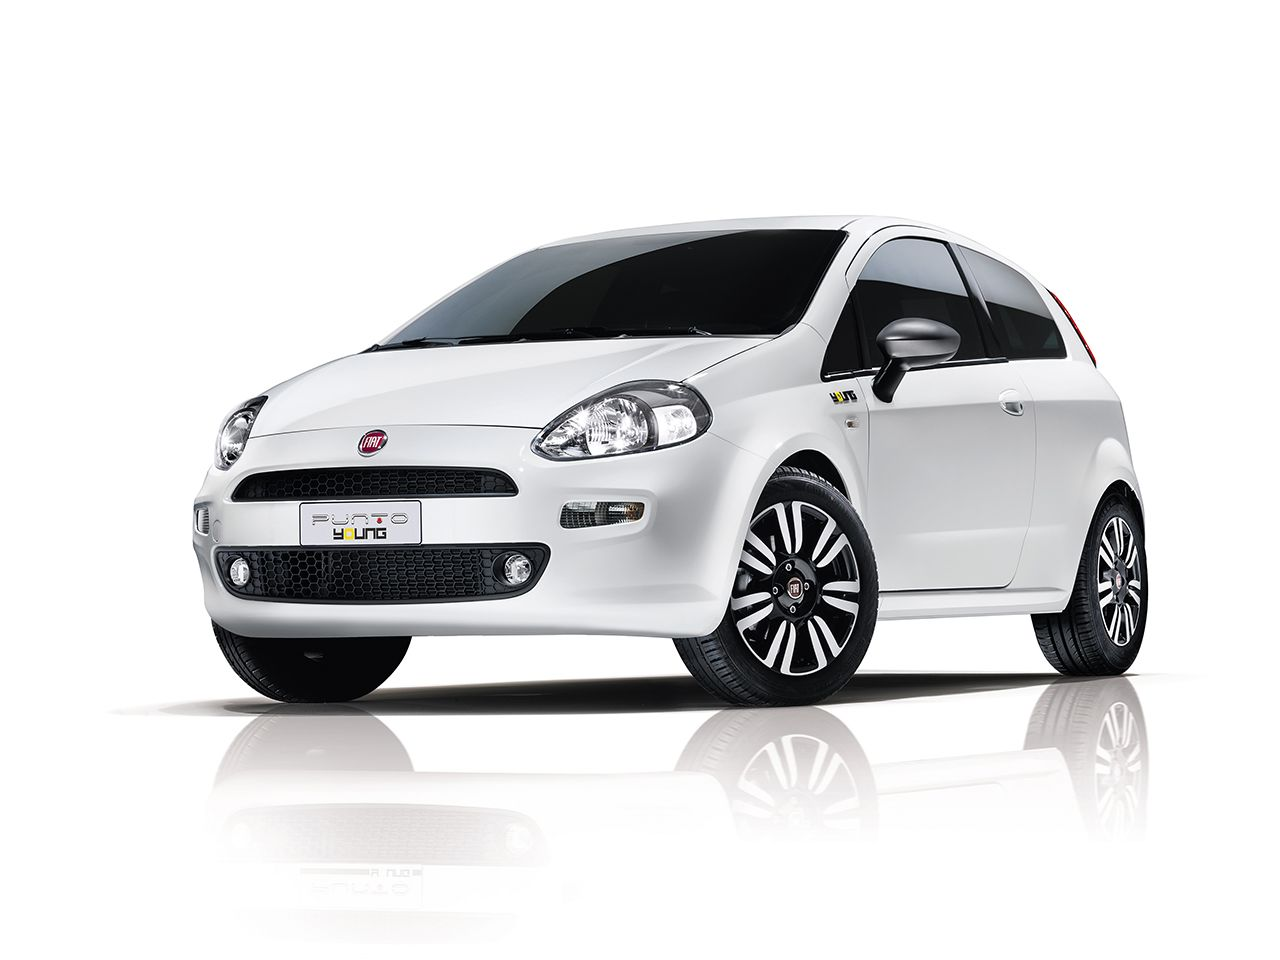 Sondermodelle: Fiat Panda Young & Fiat Punto Young